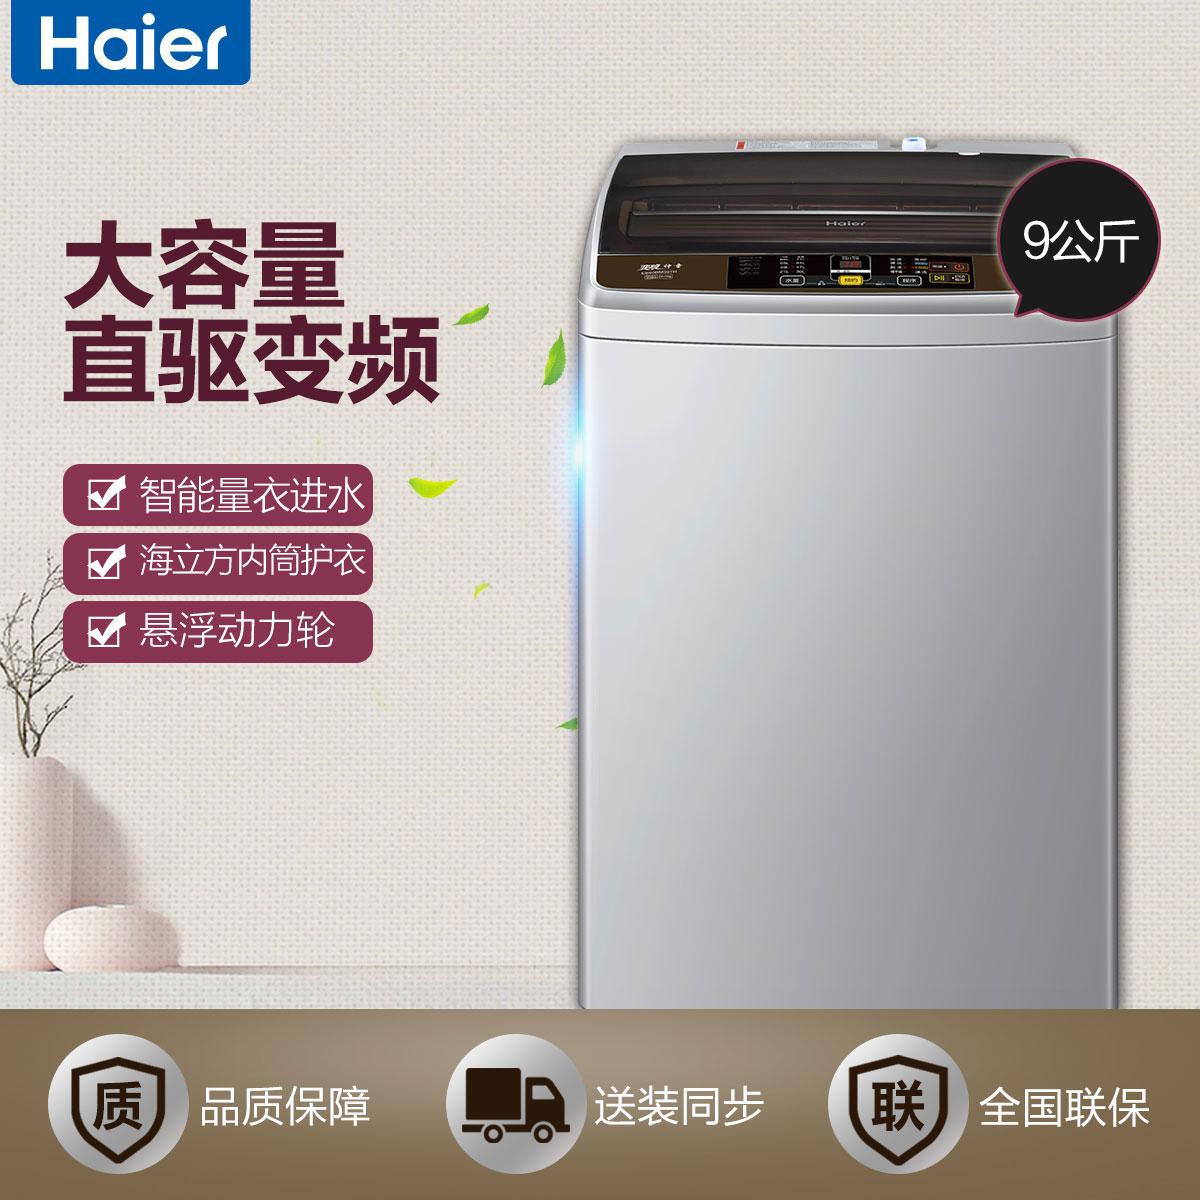 Haier/海尔 波轮洗衣机 EB90BM39TH 9公斤直驱变频波轮洗衣机